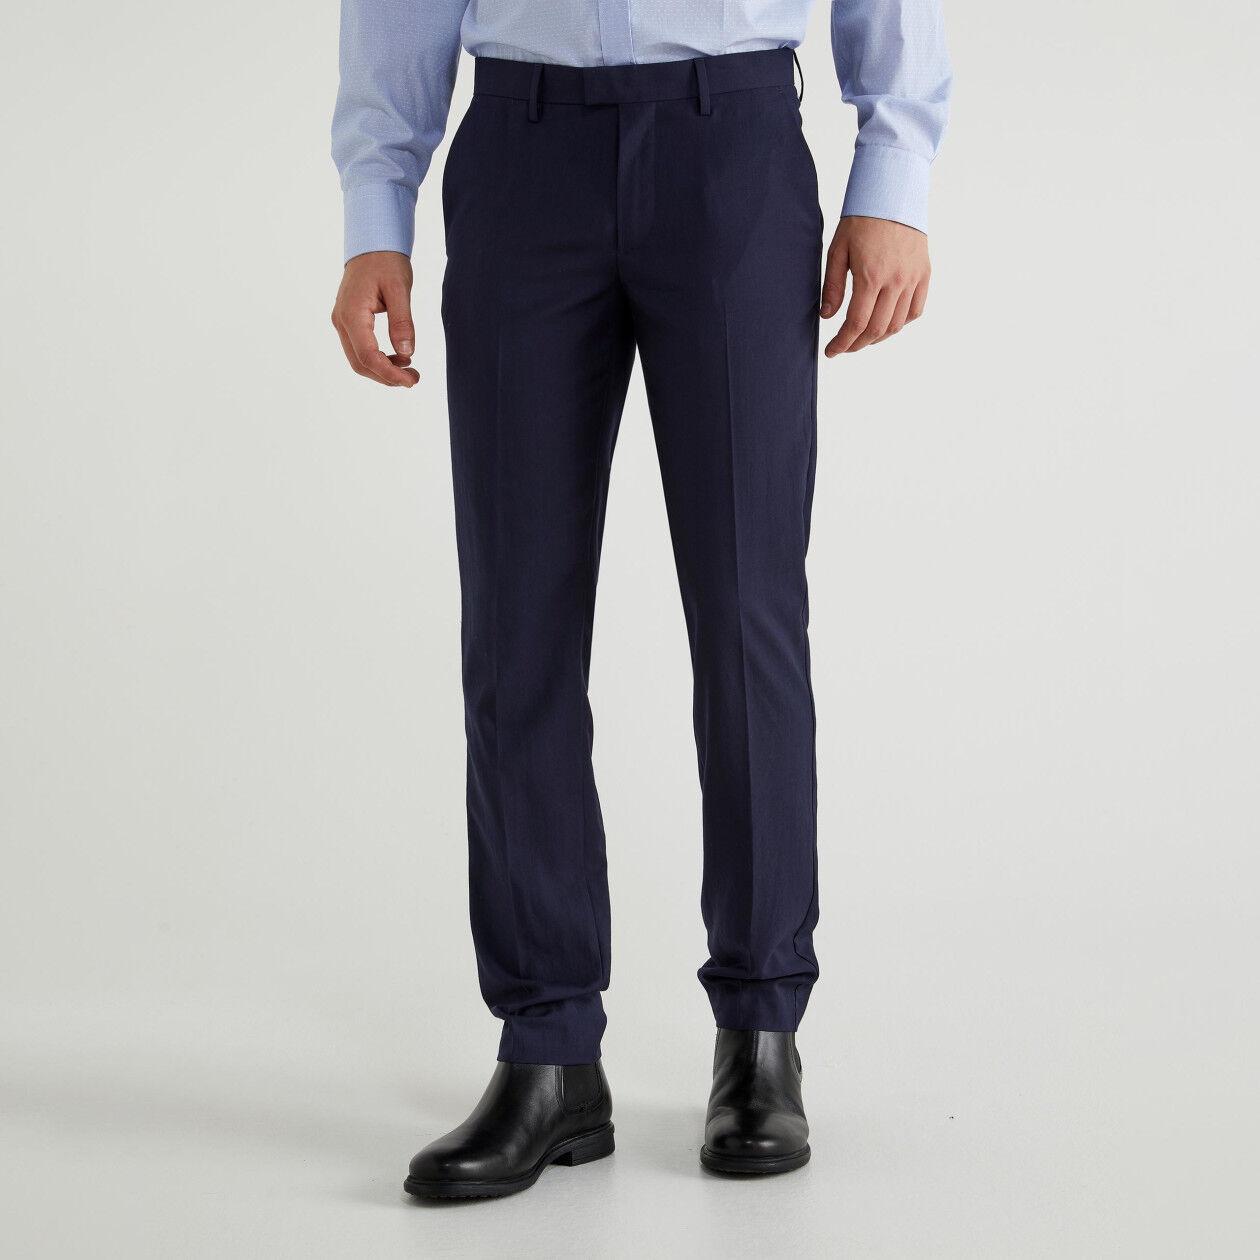 Pantalón con raya planchada